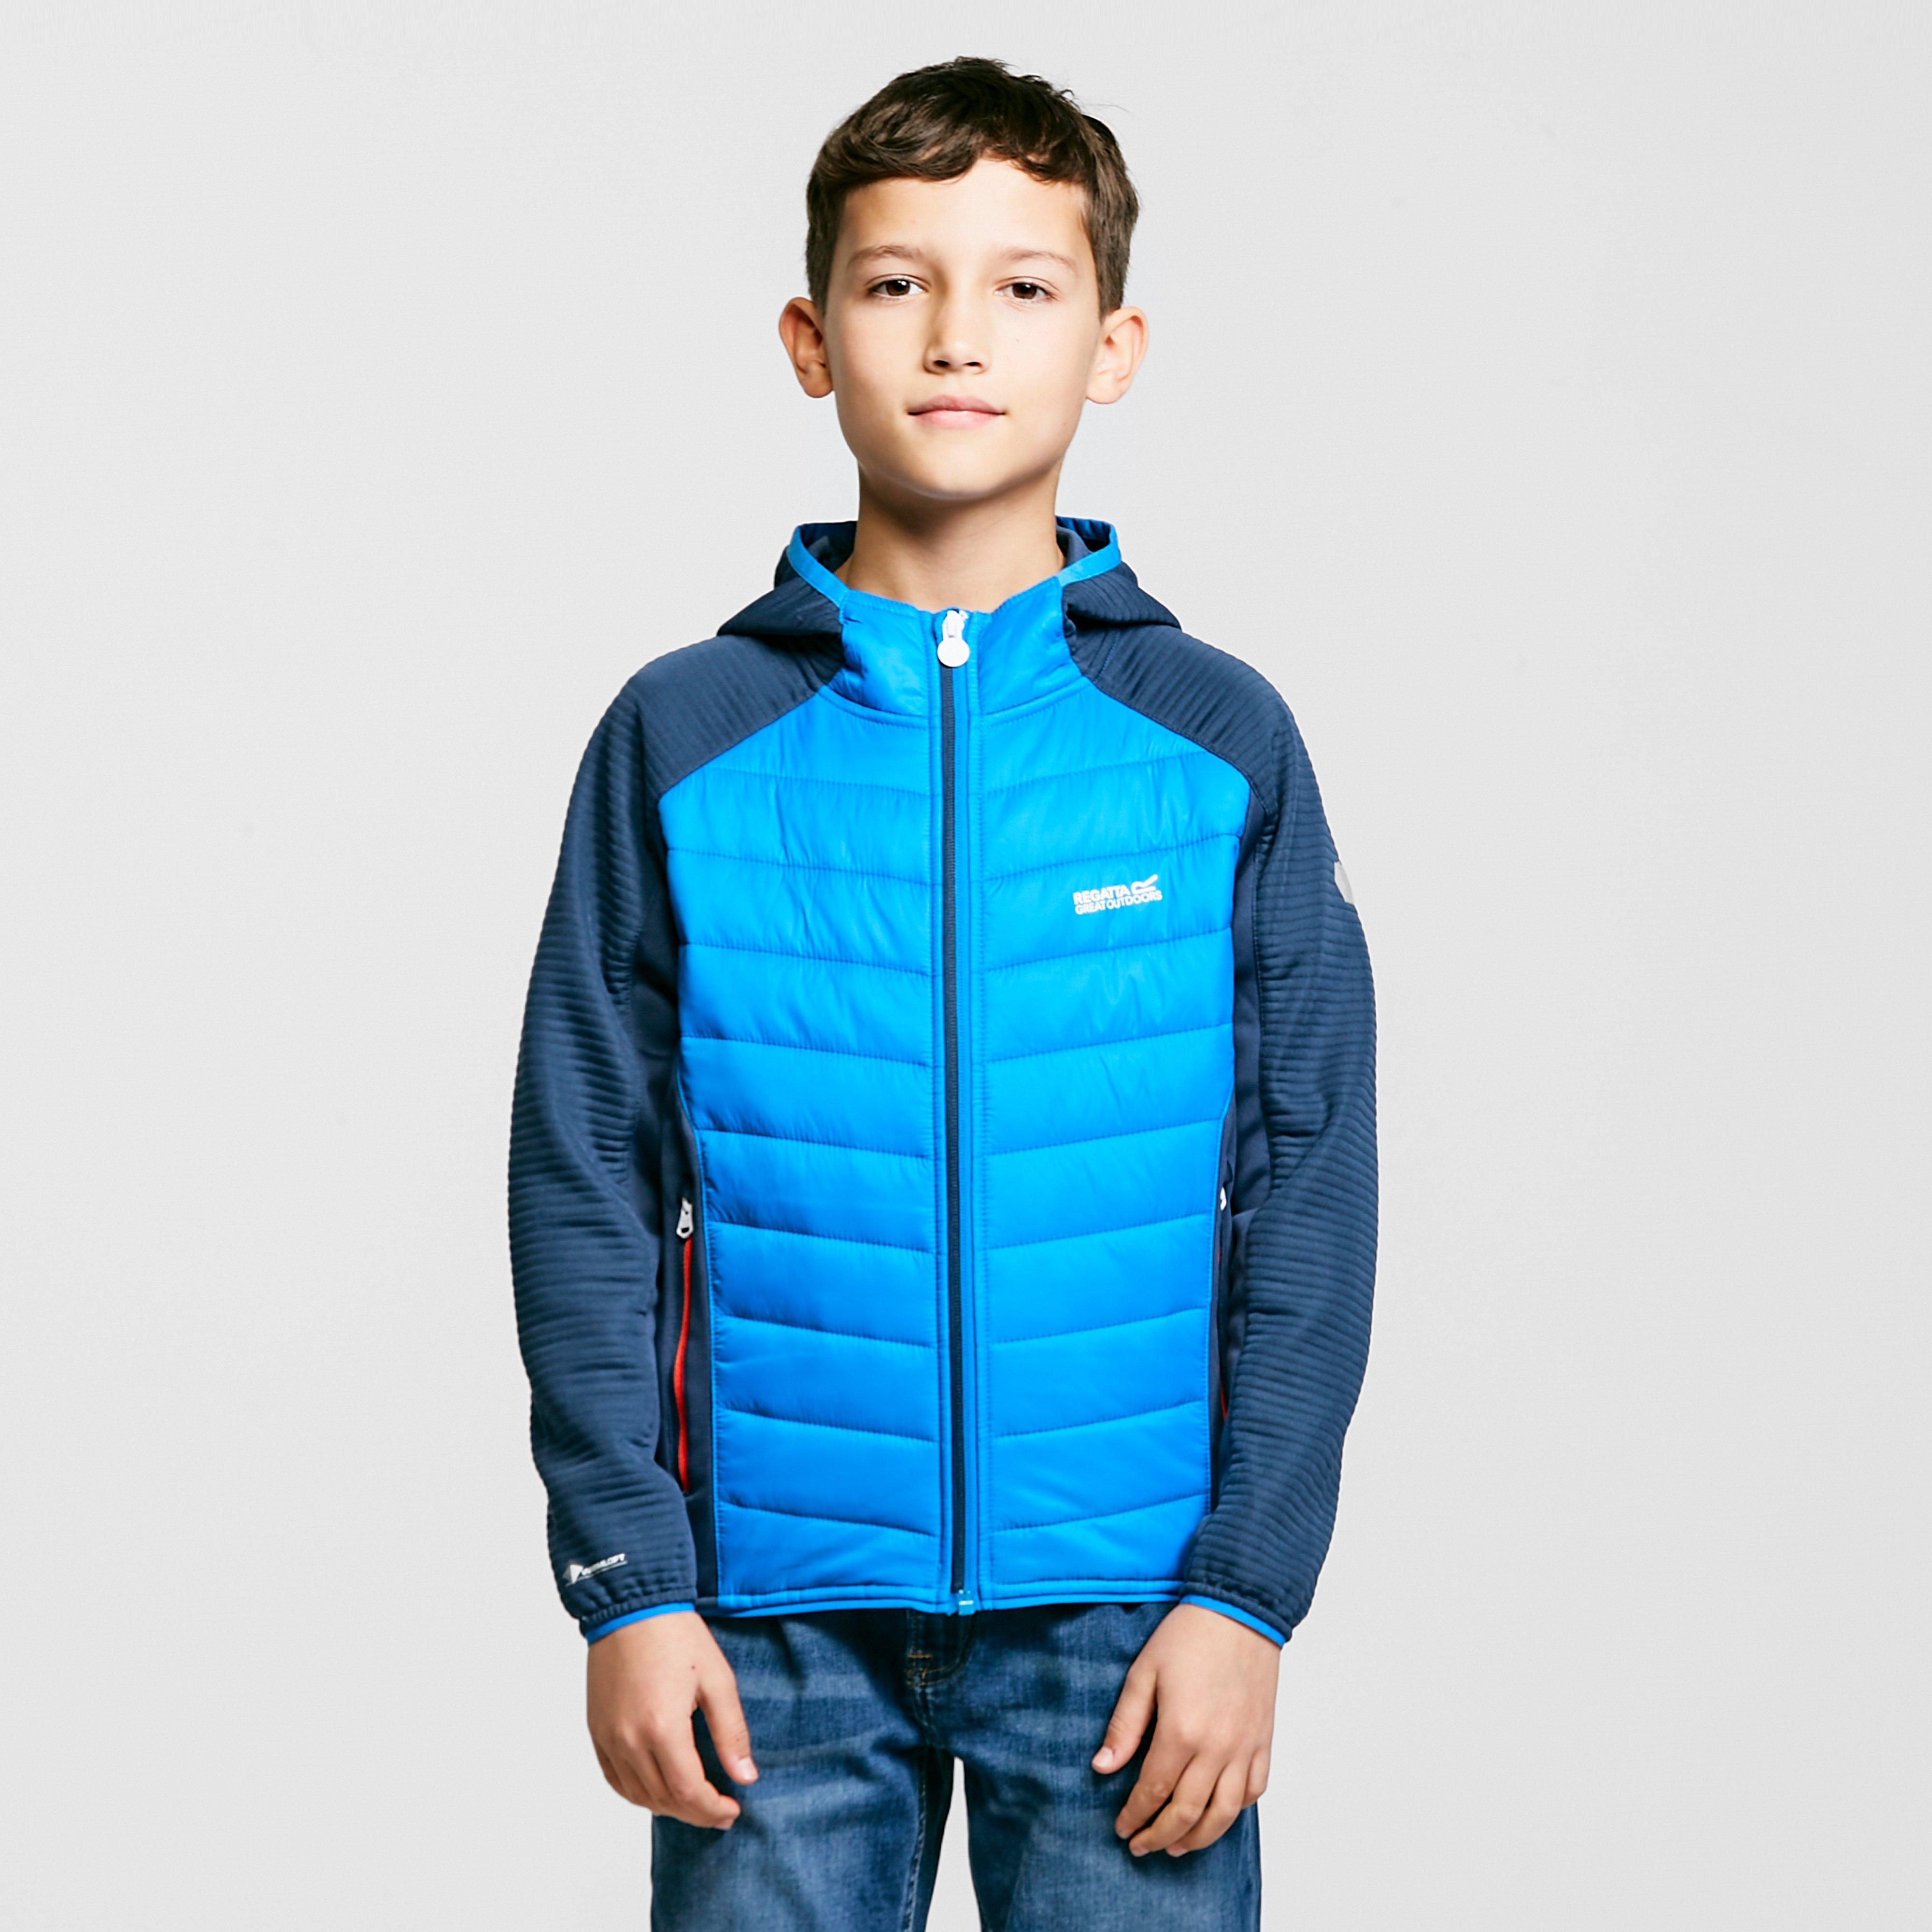 Image of Regatta Kids Kielder Iv Hybrid Jacket - Blue/Blue, Blue/Blue